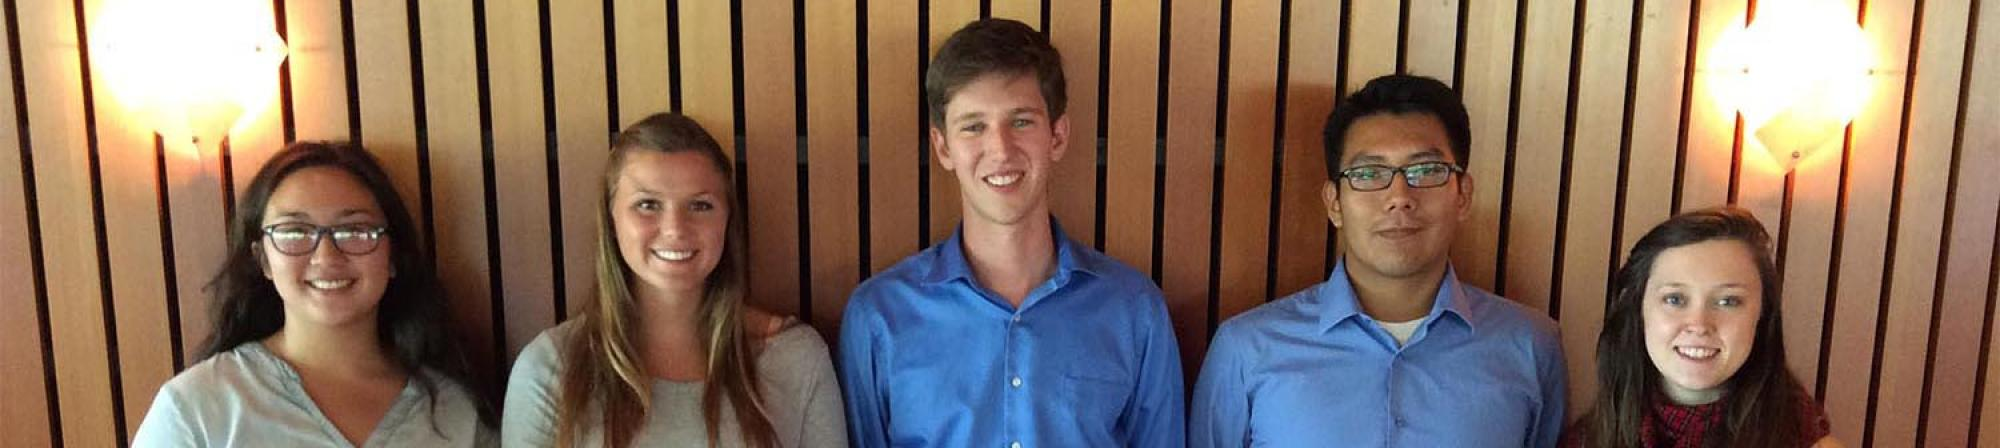 Rosenfield Program 2015 interns group portrait